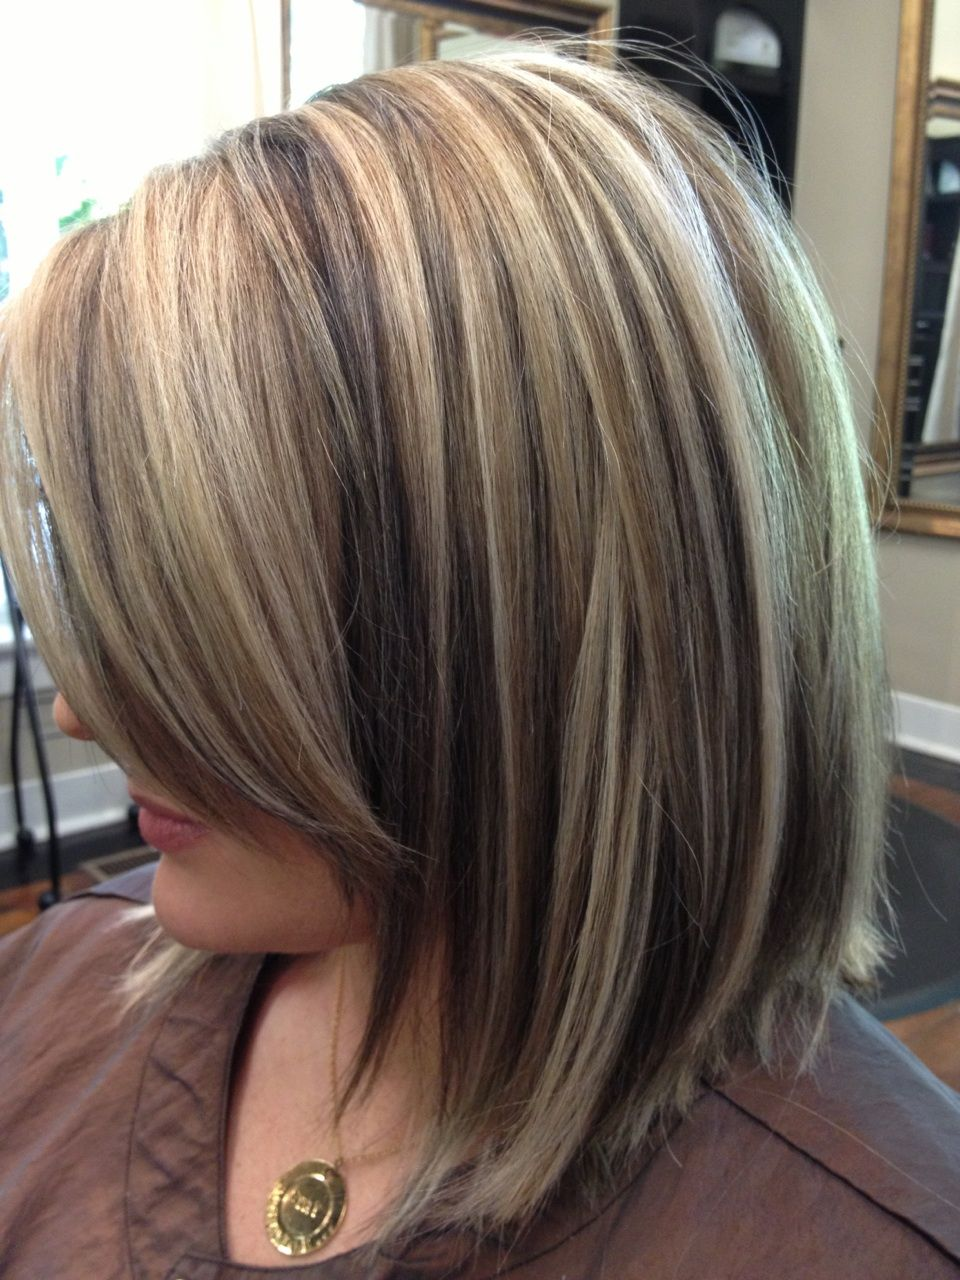 Pin By Nikita Pedersen On Hair Hair Styles Dark Hair With Highlights Blonde Highlights On Dark Hair